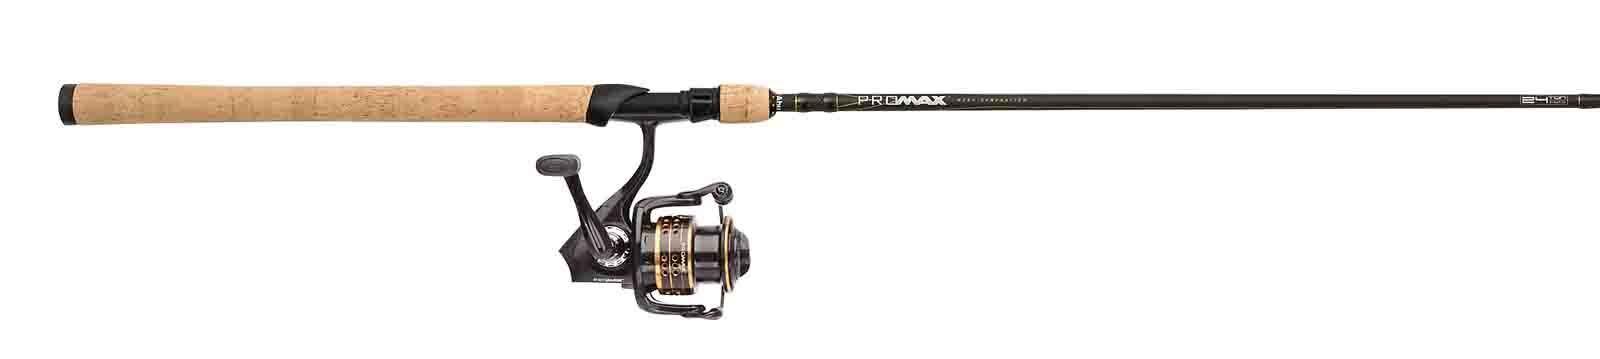 Abu Garcia New Pro Max Front Drag Spin Fishing Spinning Combo Kits - Rod & Reel